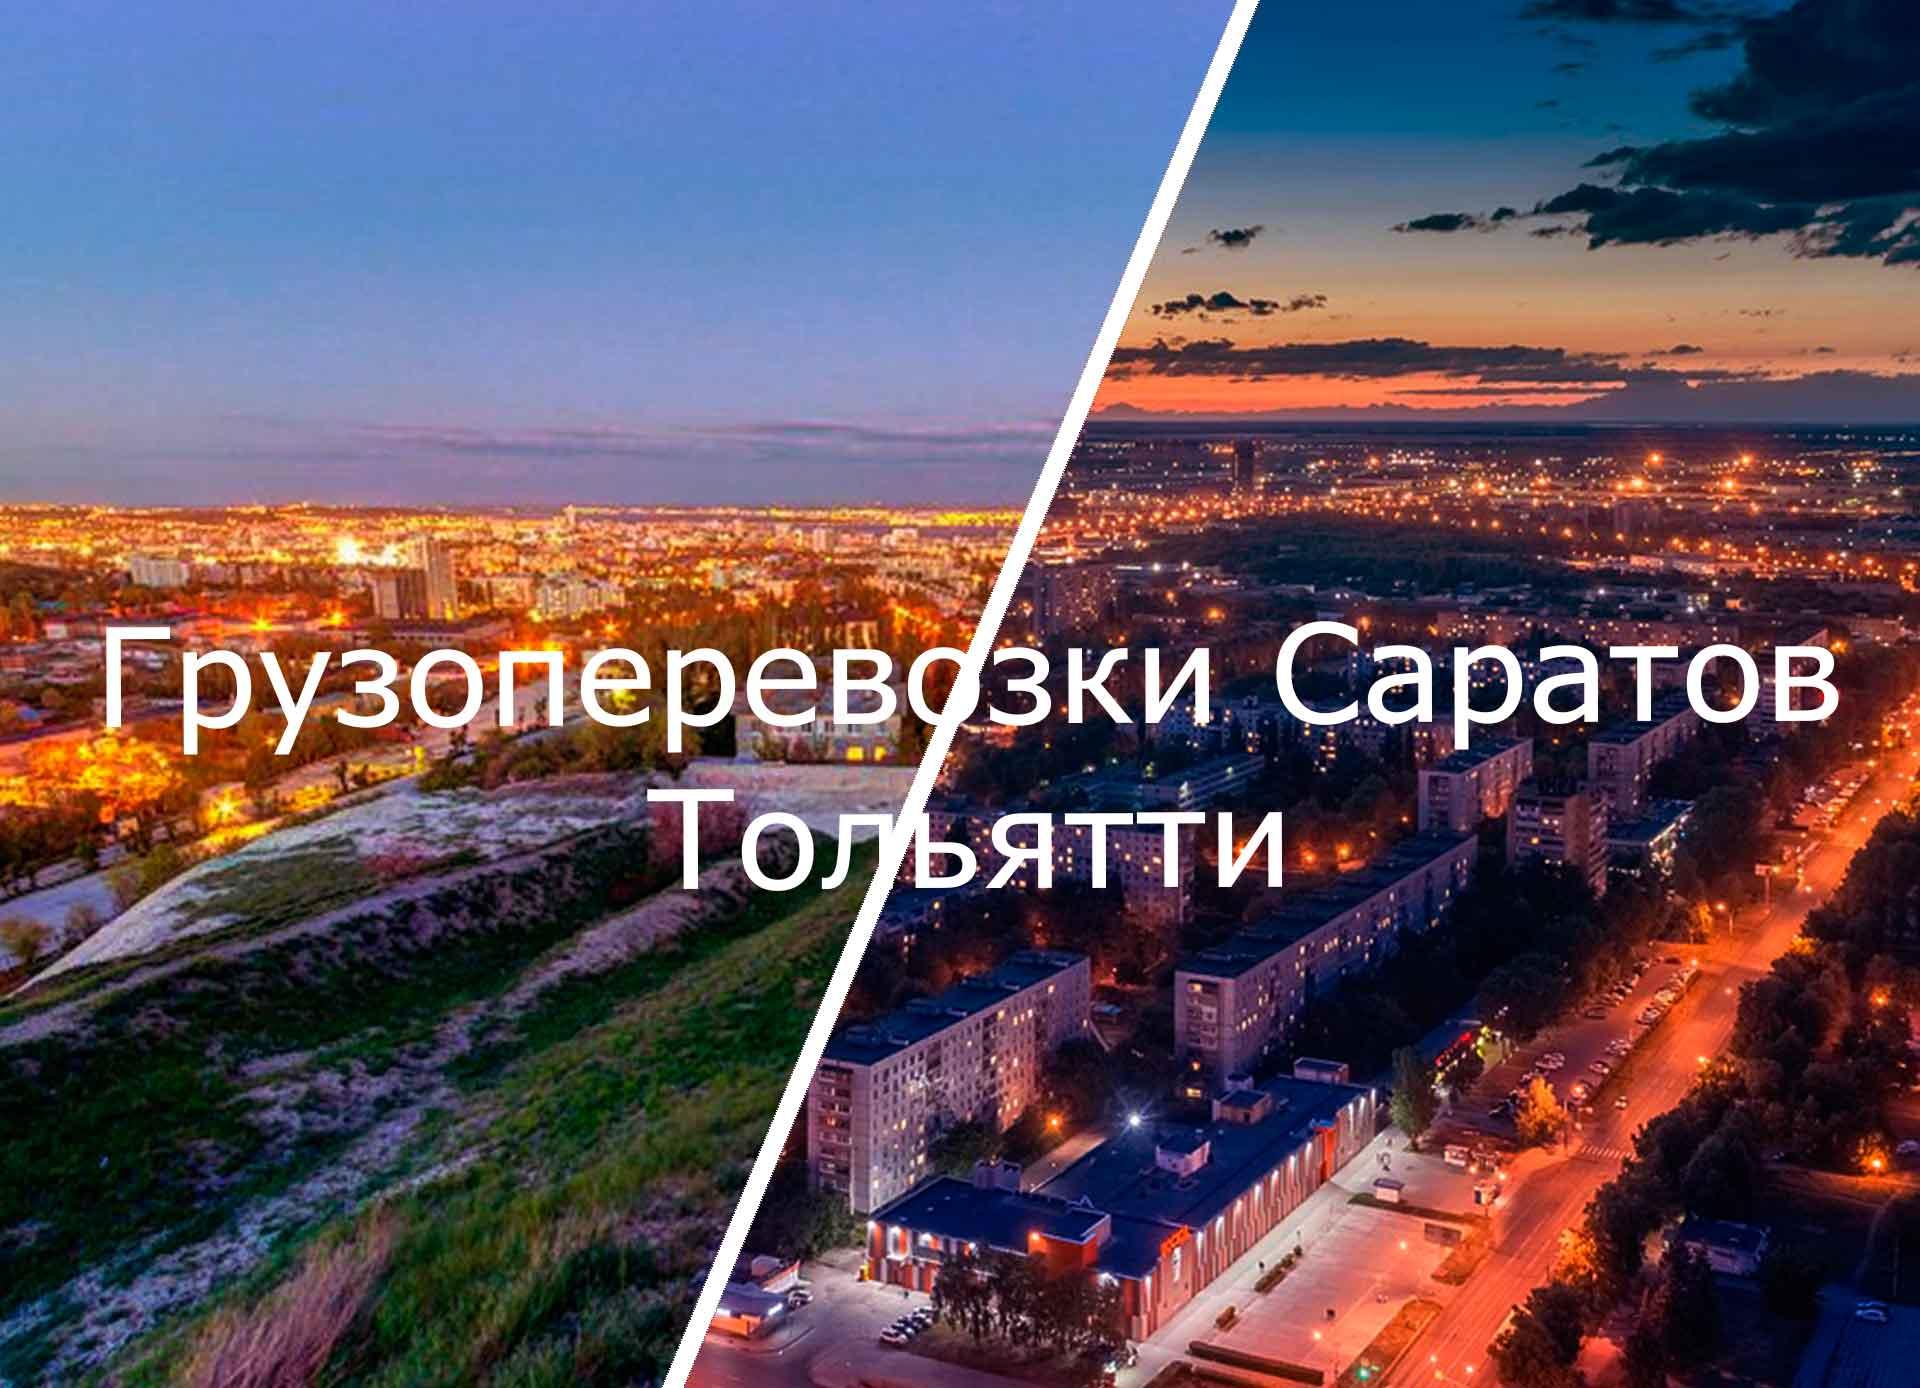 грузоперевозки саратов тольятти